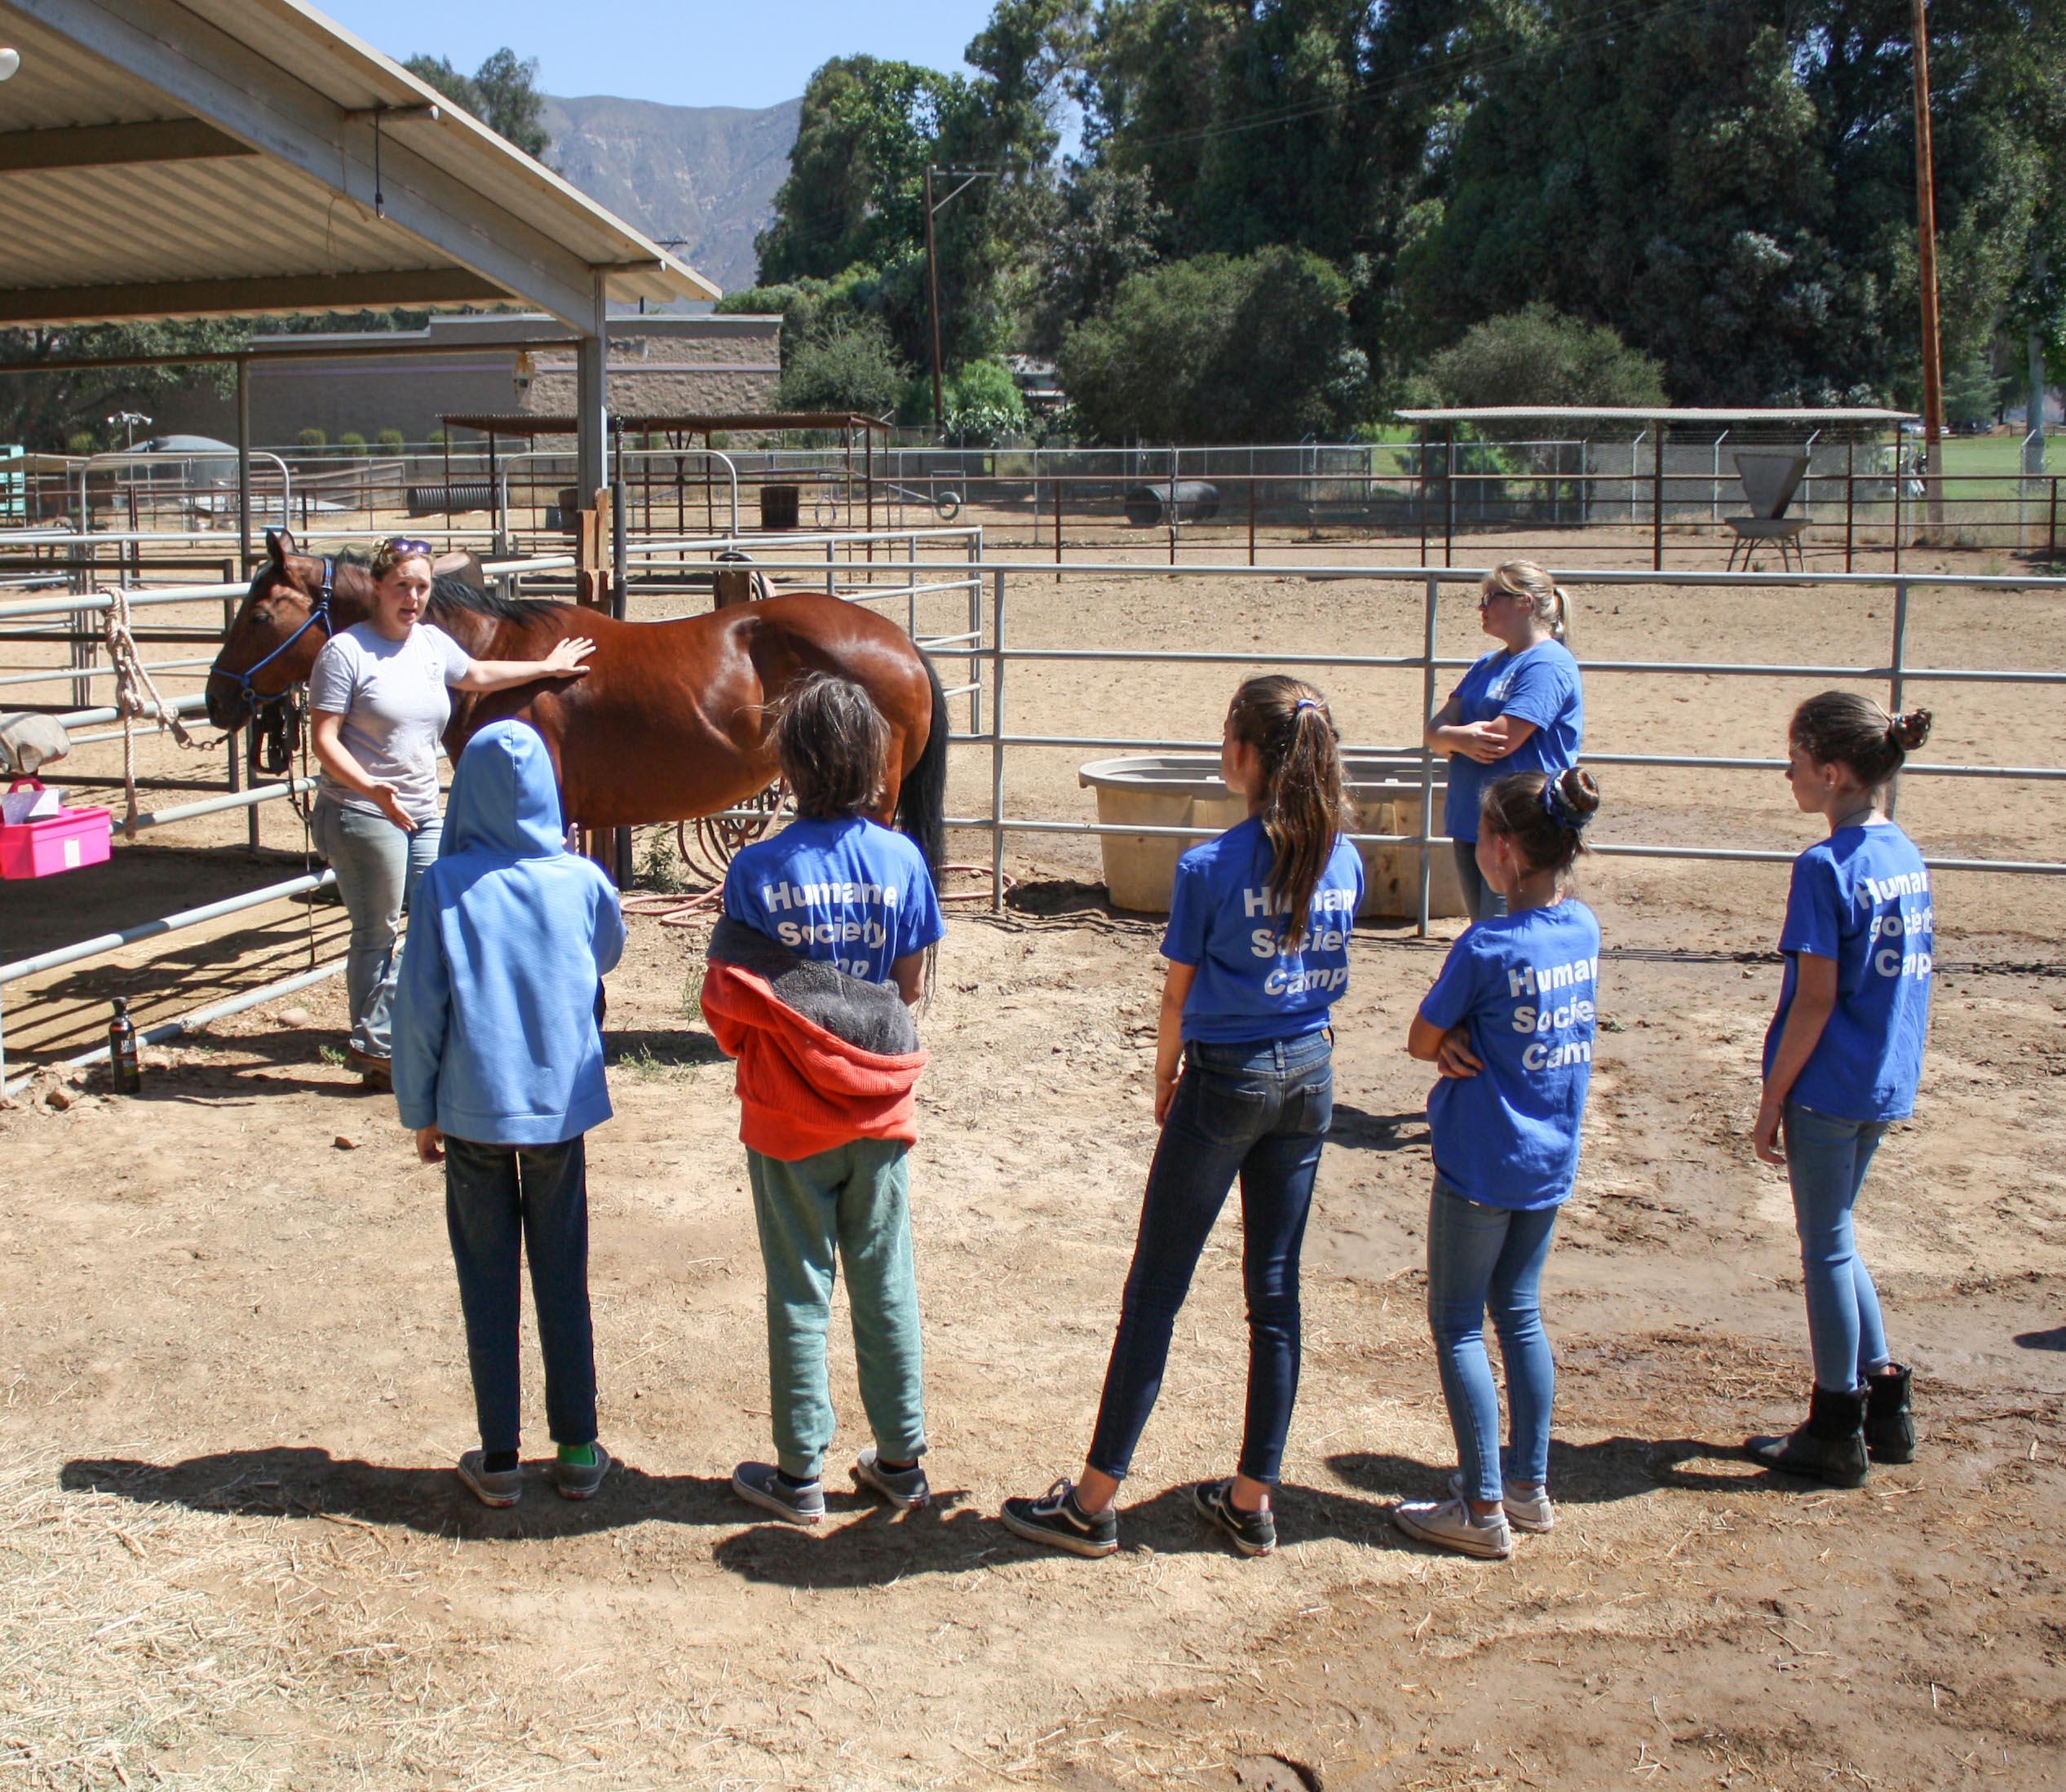 camper.horses.jpg